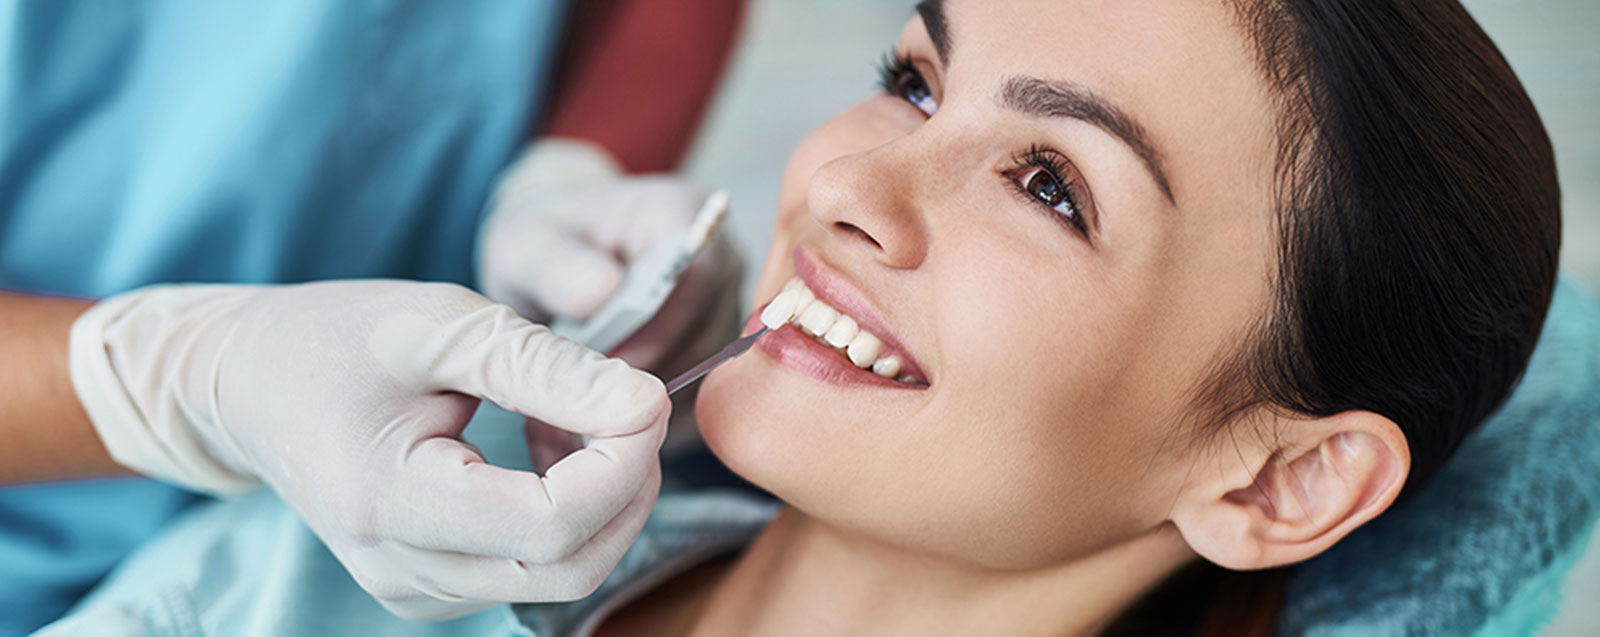 Ästhetische Zahnheilkunde Dominik Meling